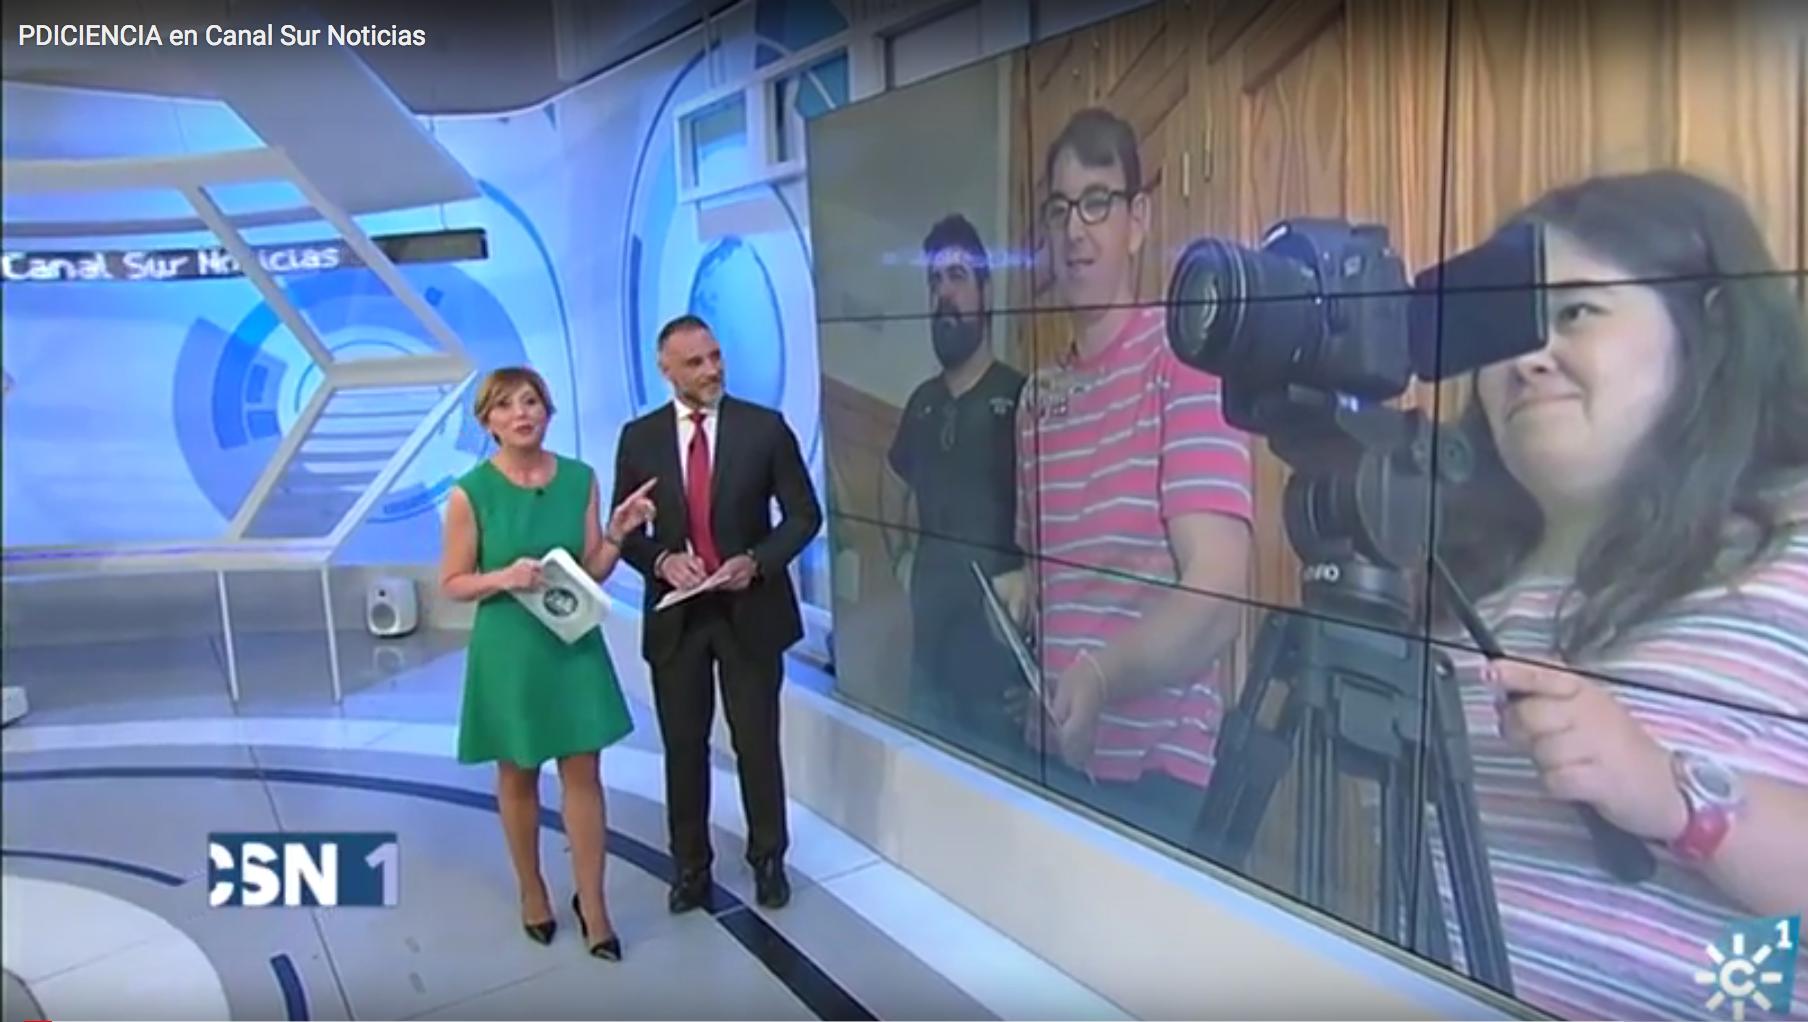 Noticia en Canal Sur Noticias Andalucía. Canal Sur Televisión